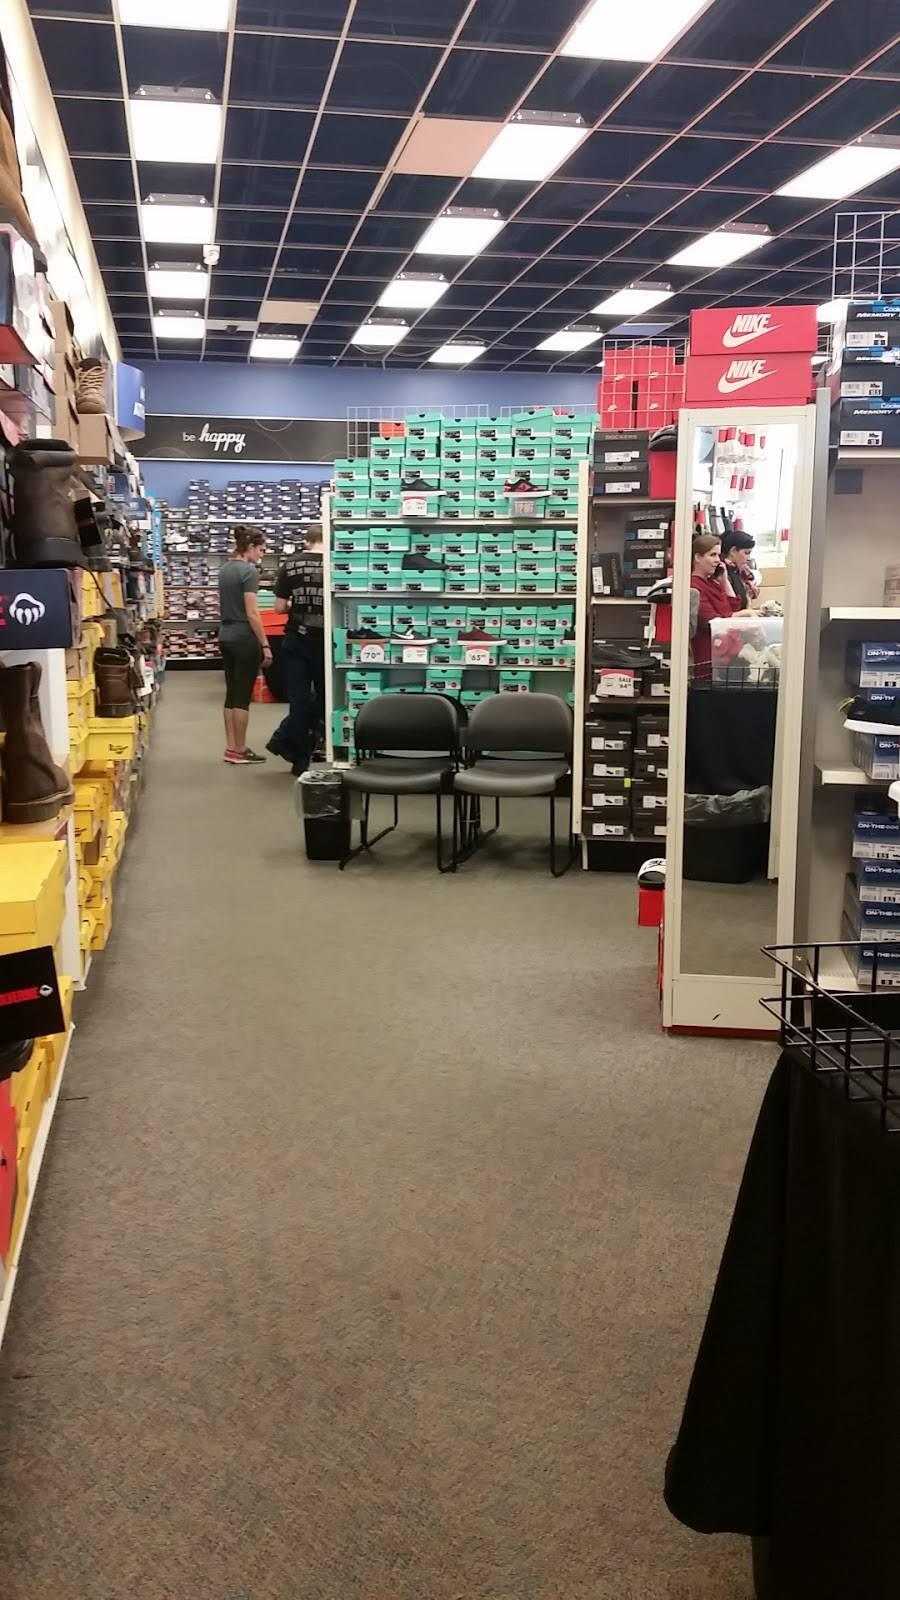 Shoe Carnival - shoe store  | Photo 2 of 8 | Address: 12313 E 96th St N, Owasso, OK 74055, USA | Phone: (918) 376-2918